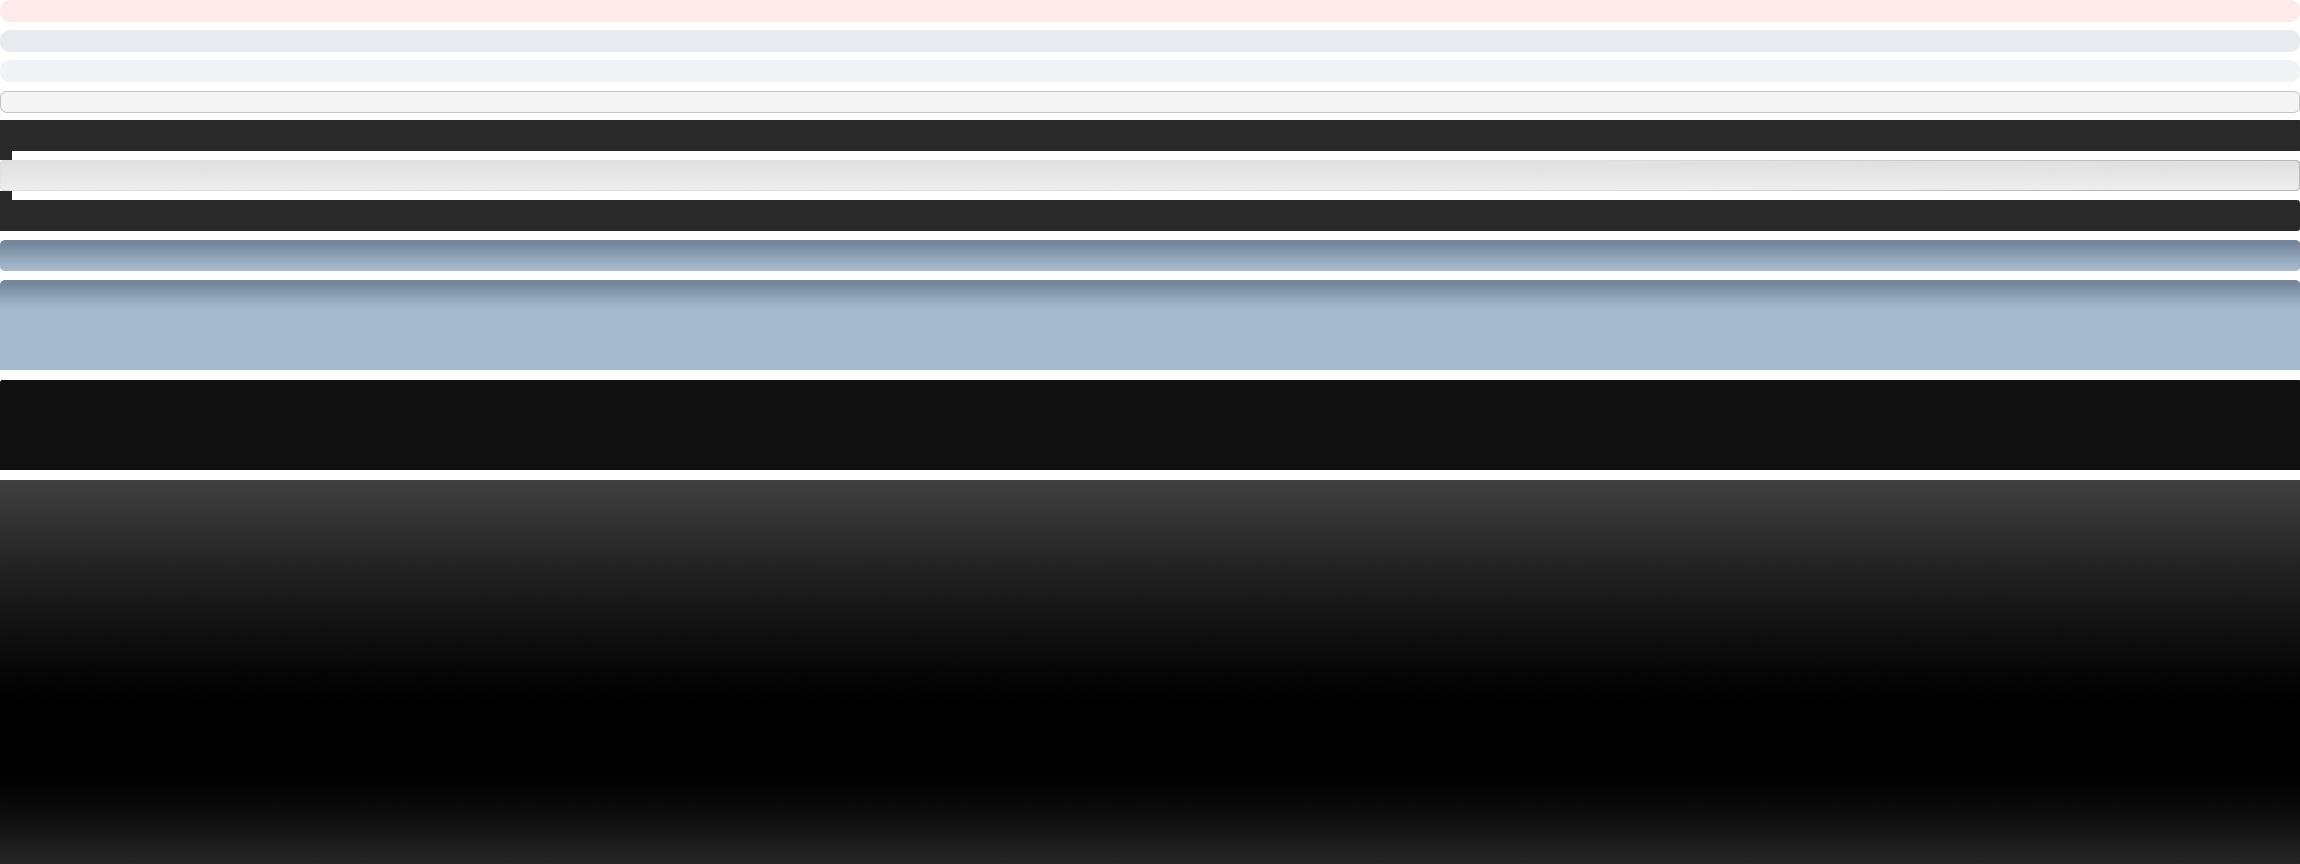 Background image bottom 0 - Margin Bottom 0 2em Approvebg Span Botslice Span Display Block Background